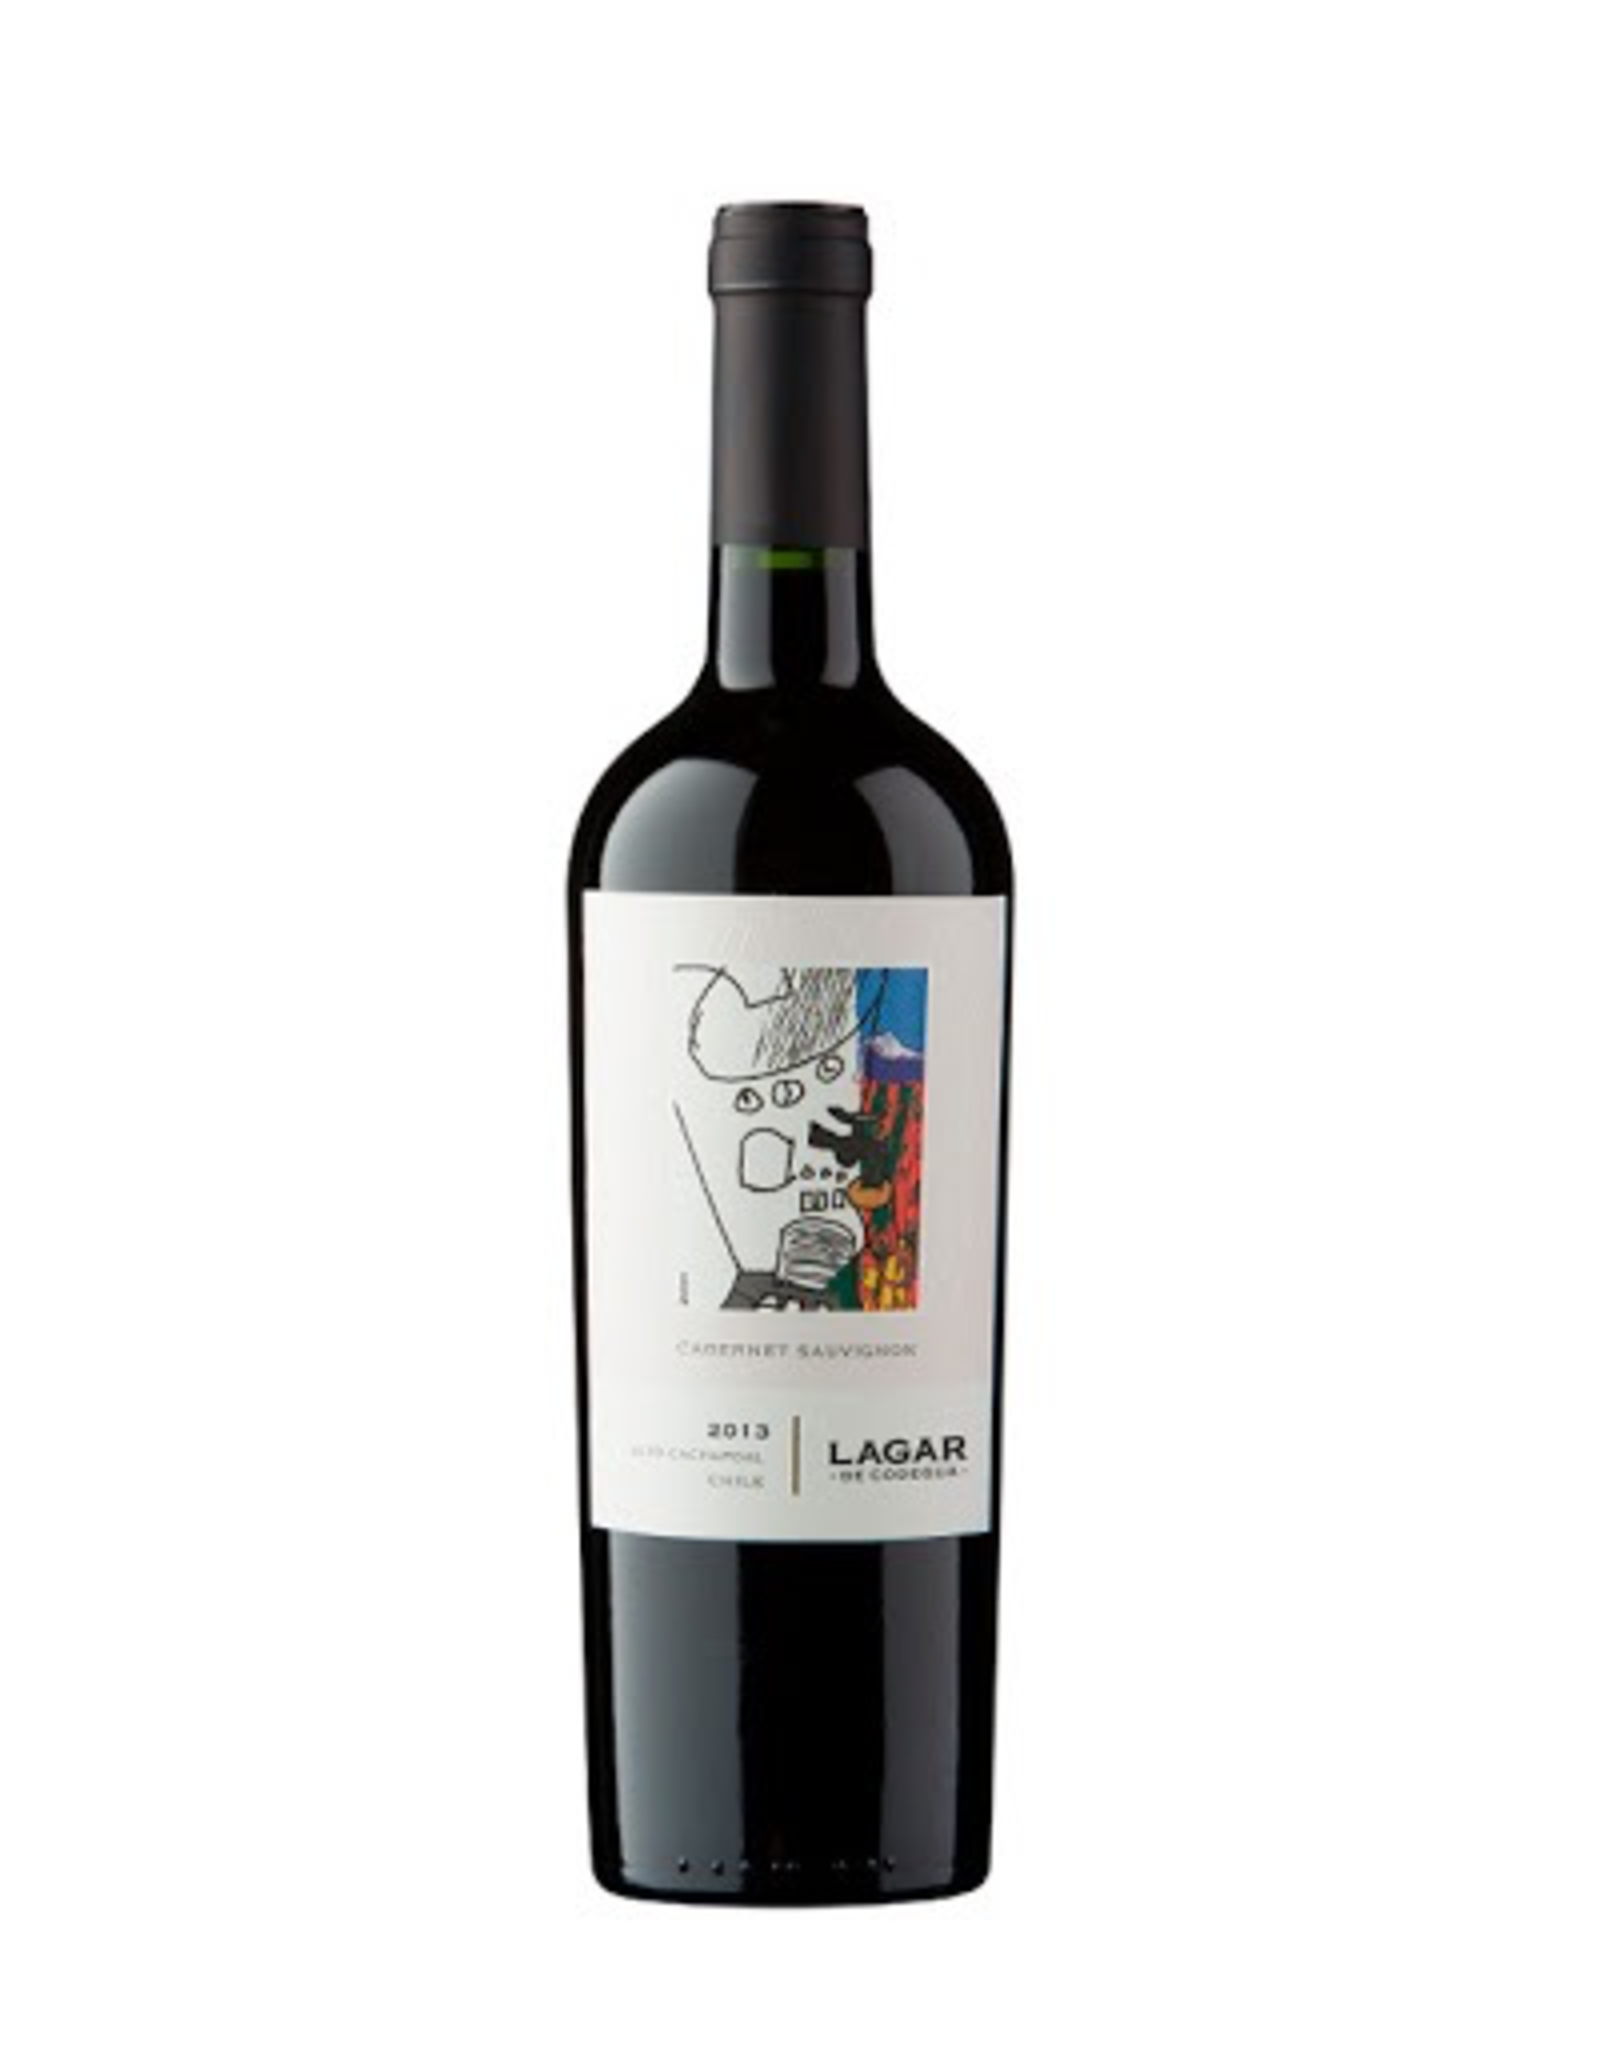 Red Wine 2013, LAGAR De Bezana, Cabernet Sauvignon, Cachapoal Valley, Rapel Valley, Chile, 13.9% Alc, CTnr